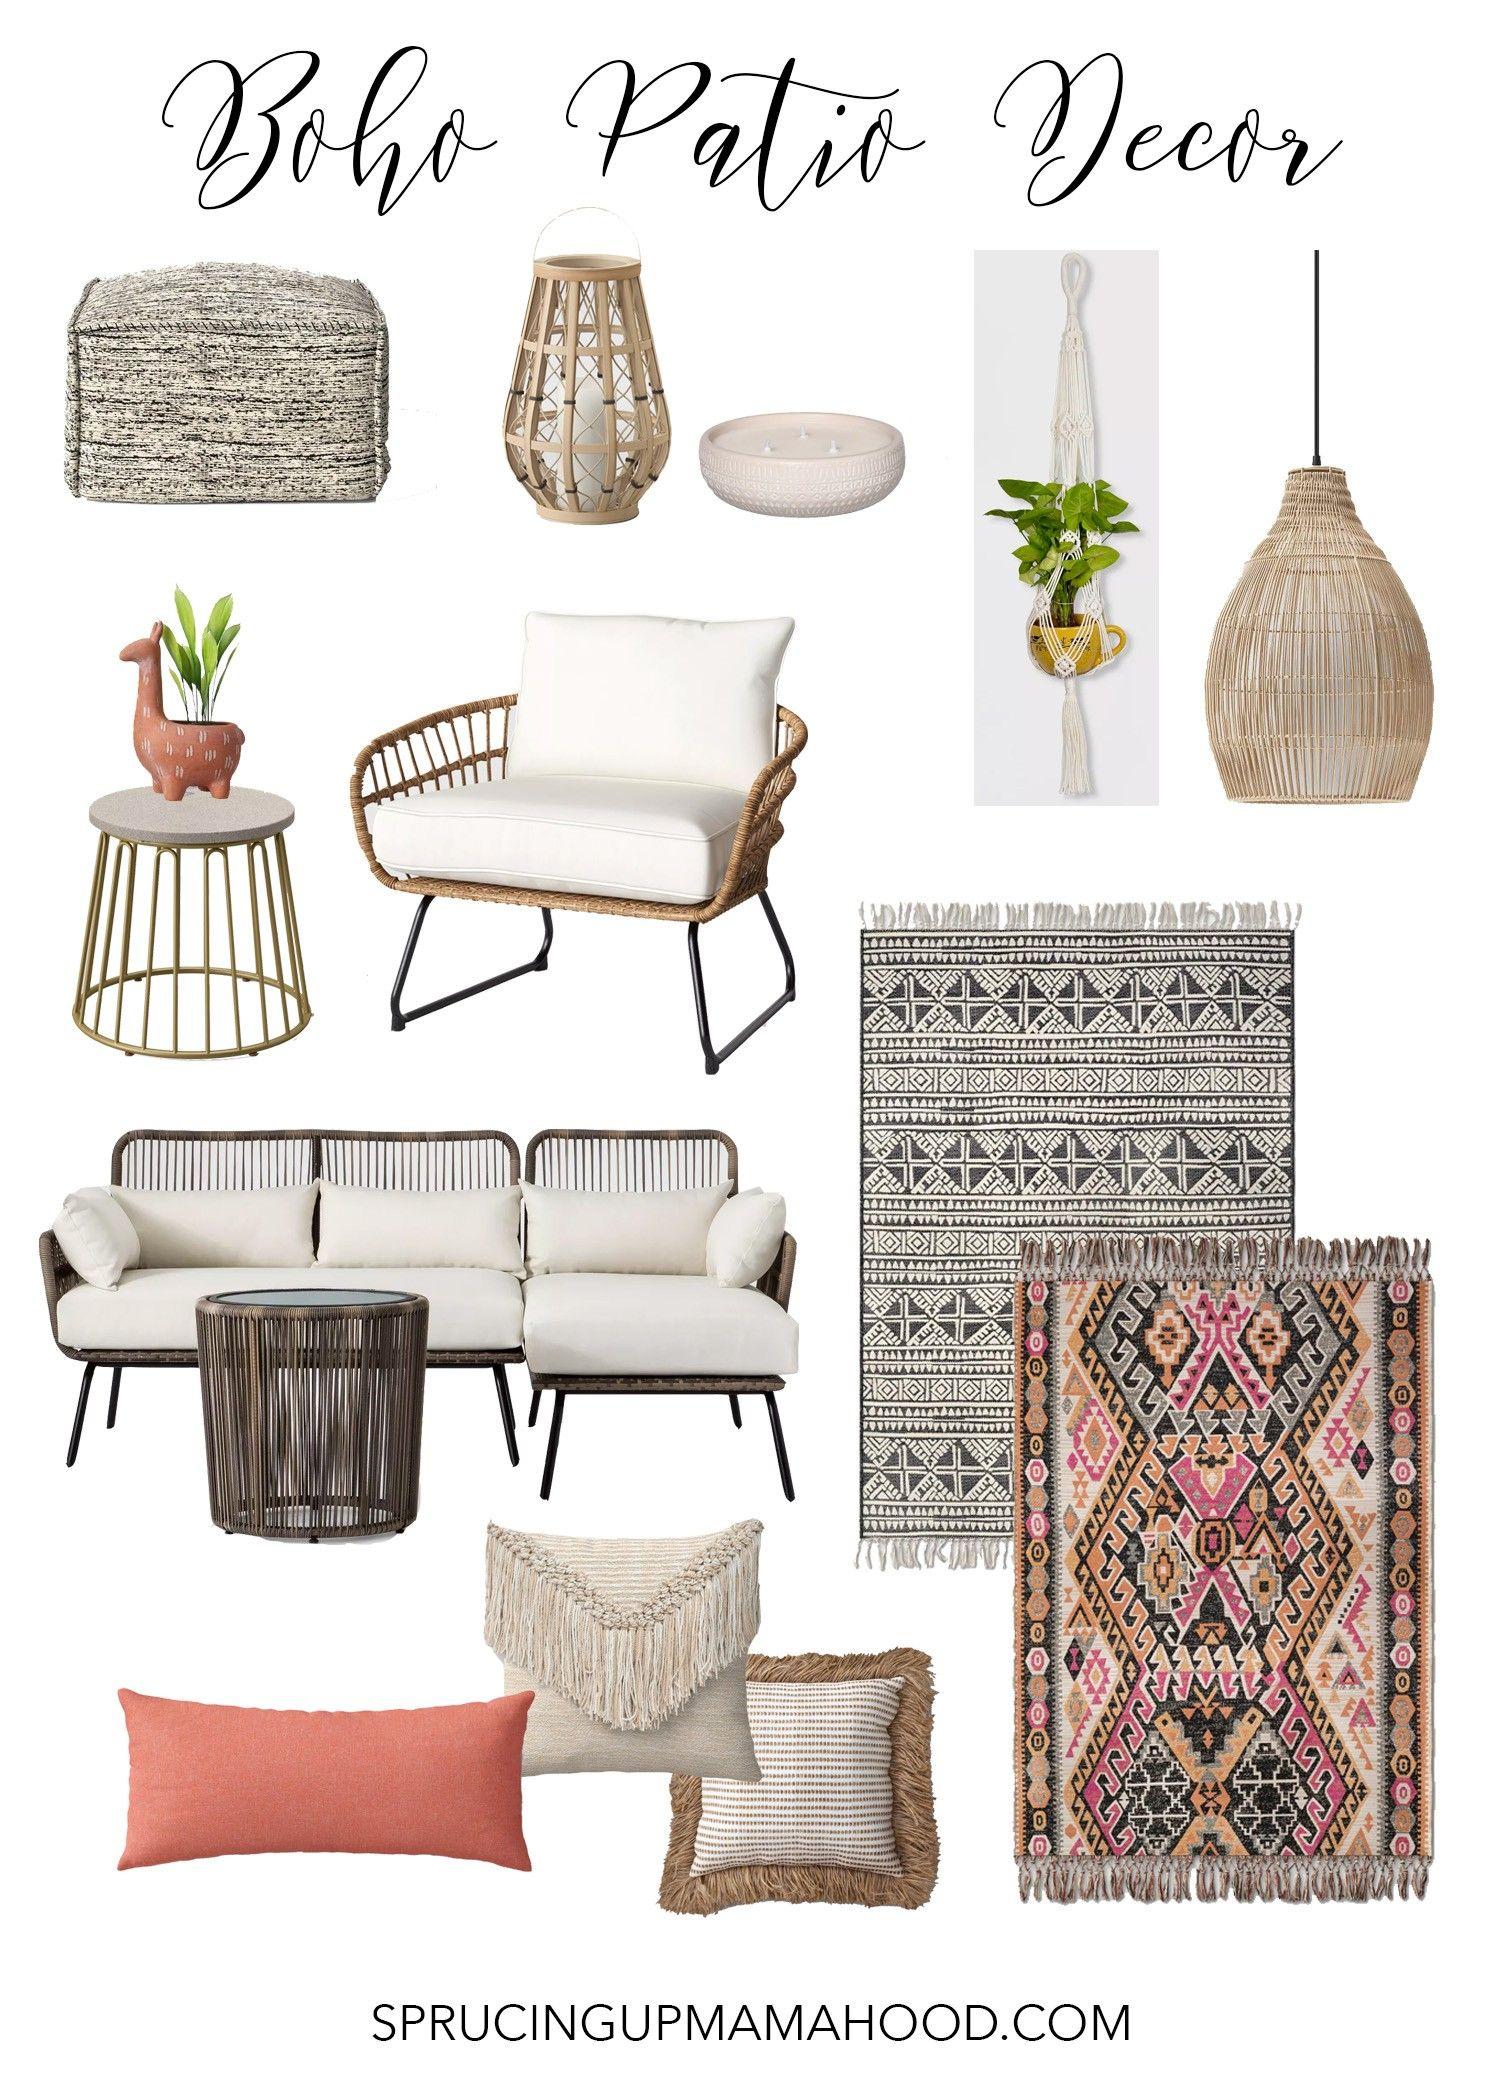 boho patio backyard furniture